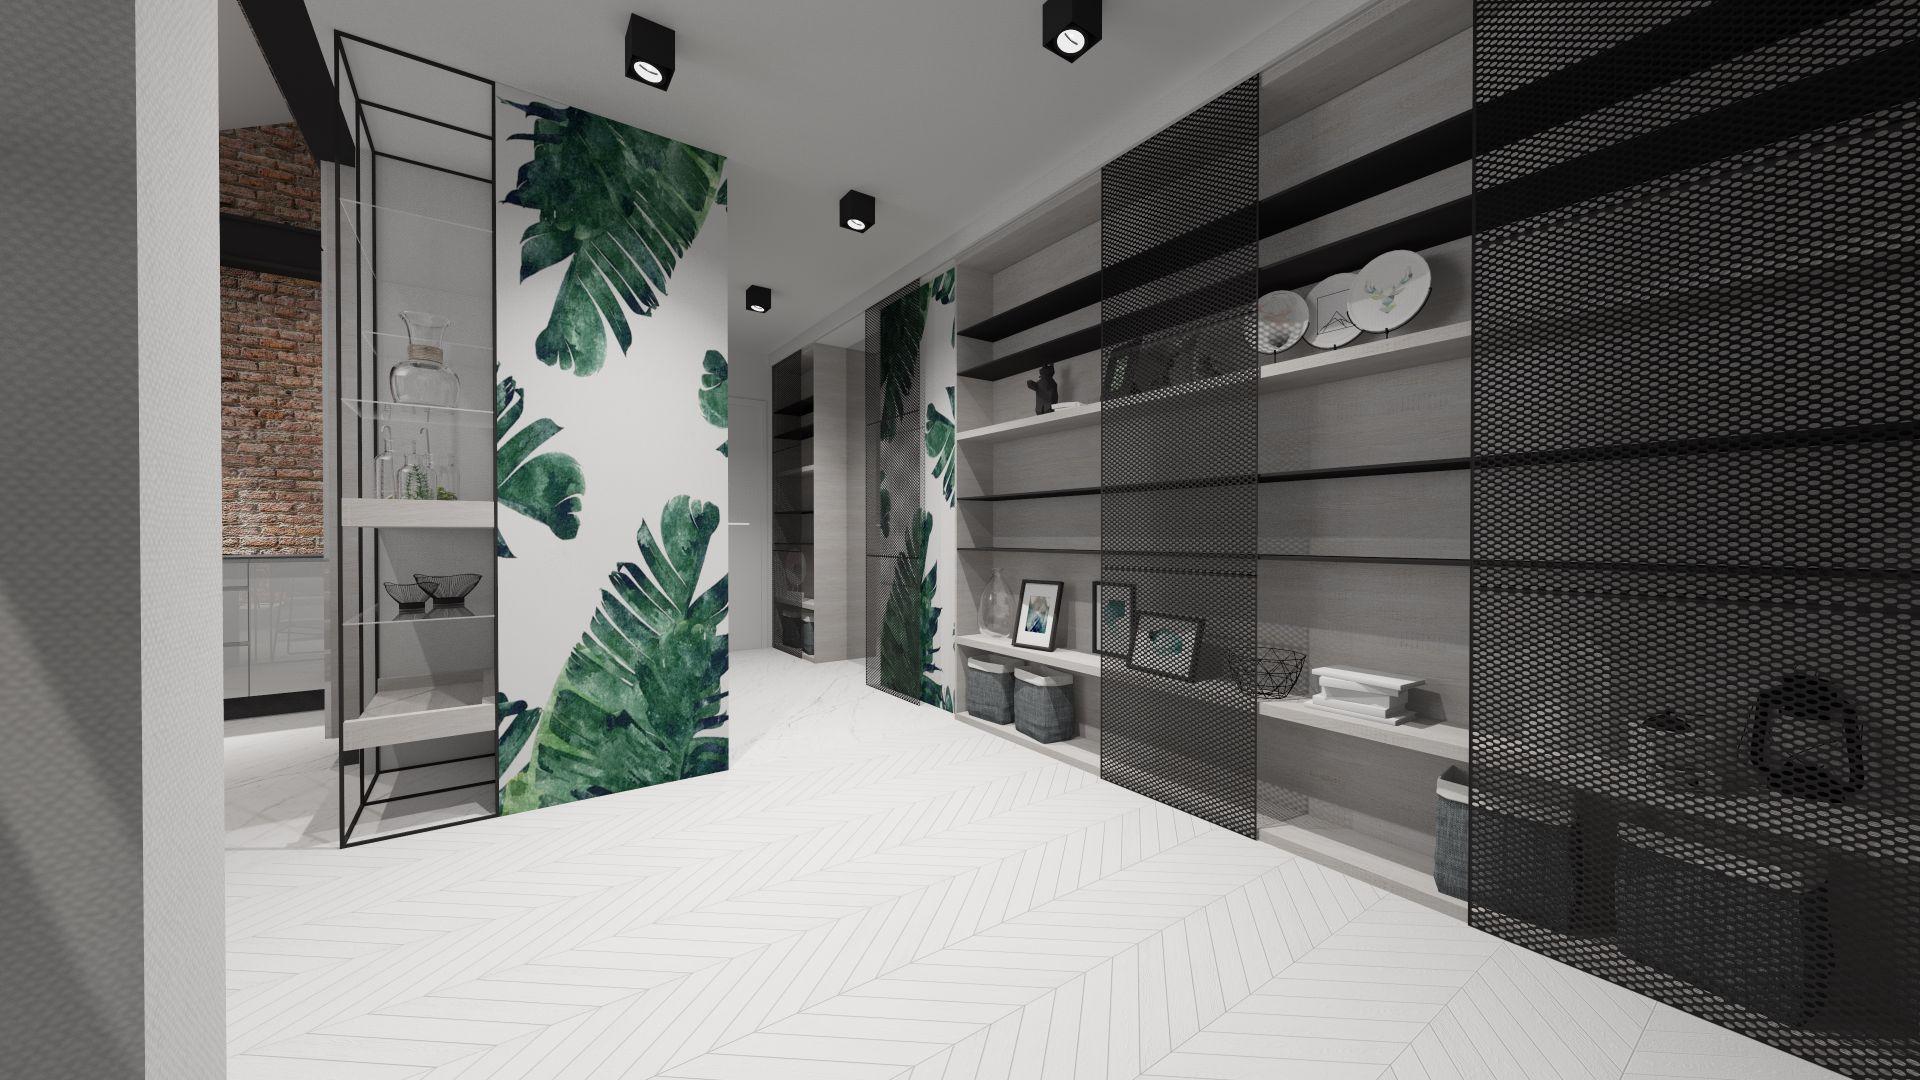 antresola_singiel_projektantpulawy-pulawy-interior-design-designer-industrial-steel-roof-antresola-brick 3